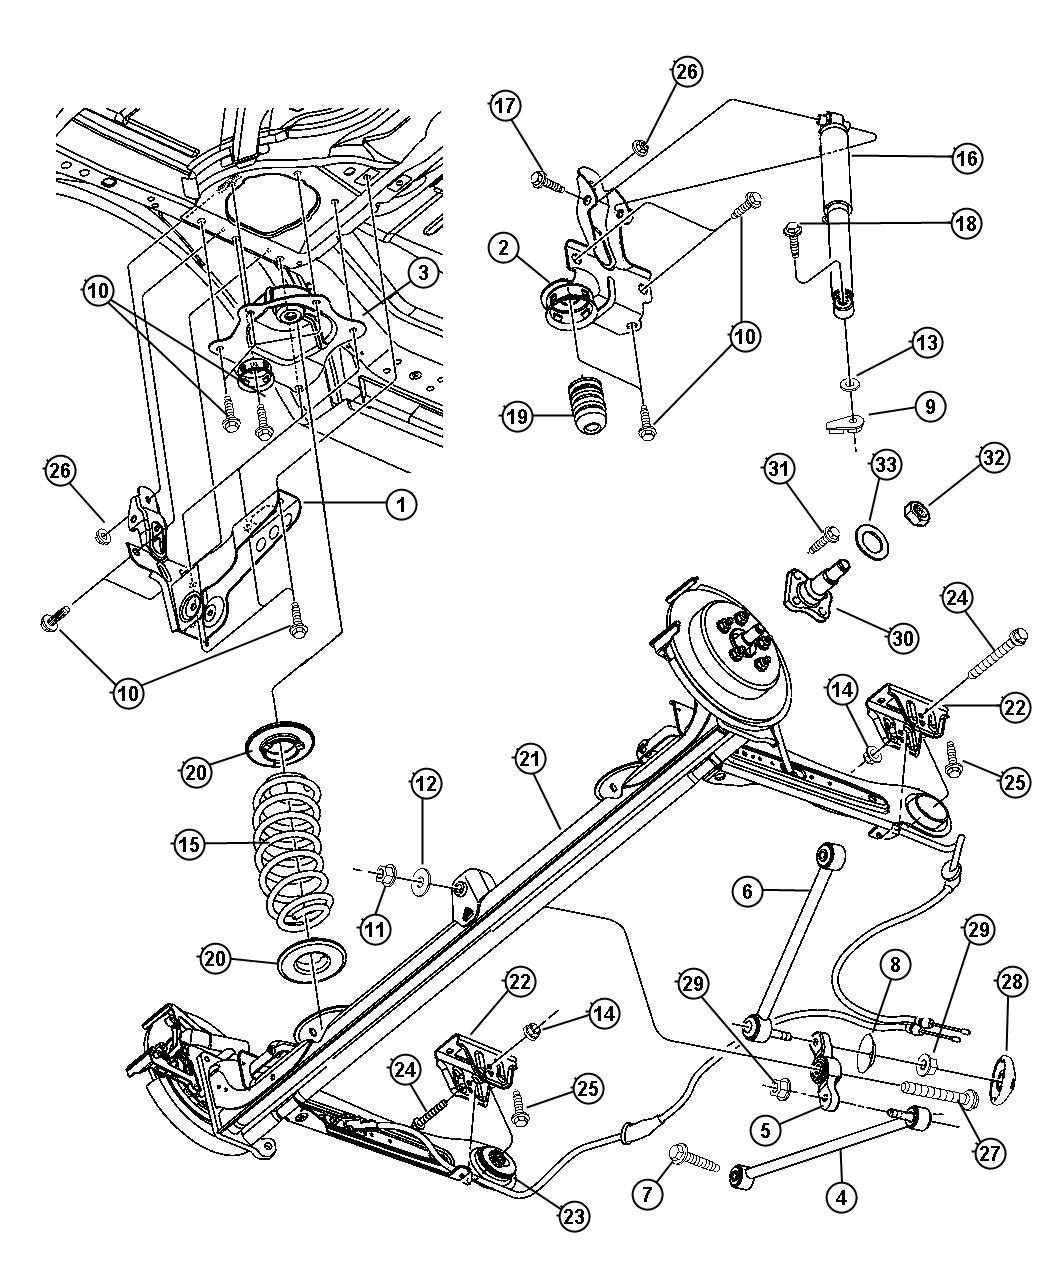 2000 daewoo korando air bag fuse box diagram